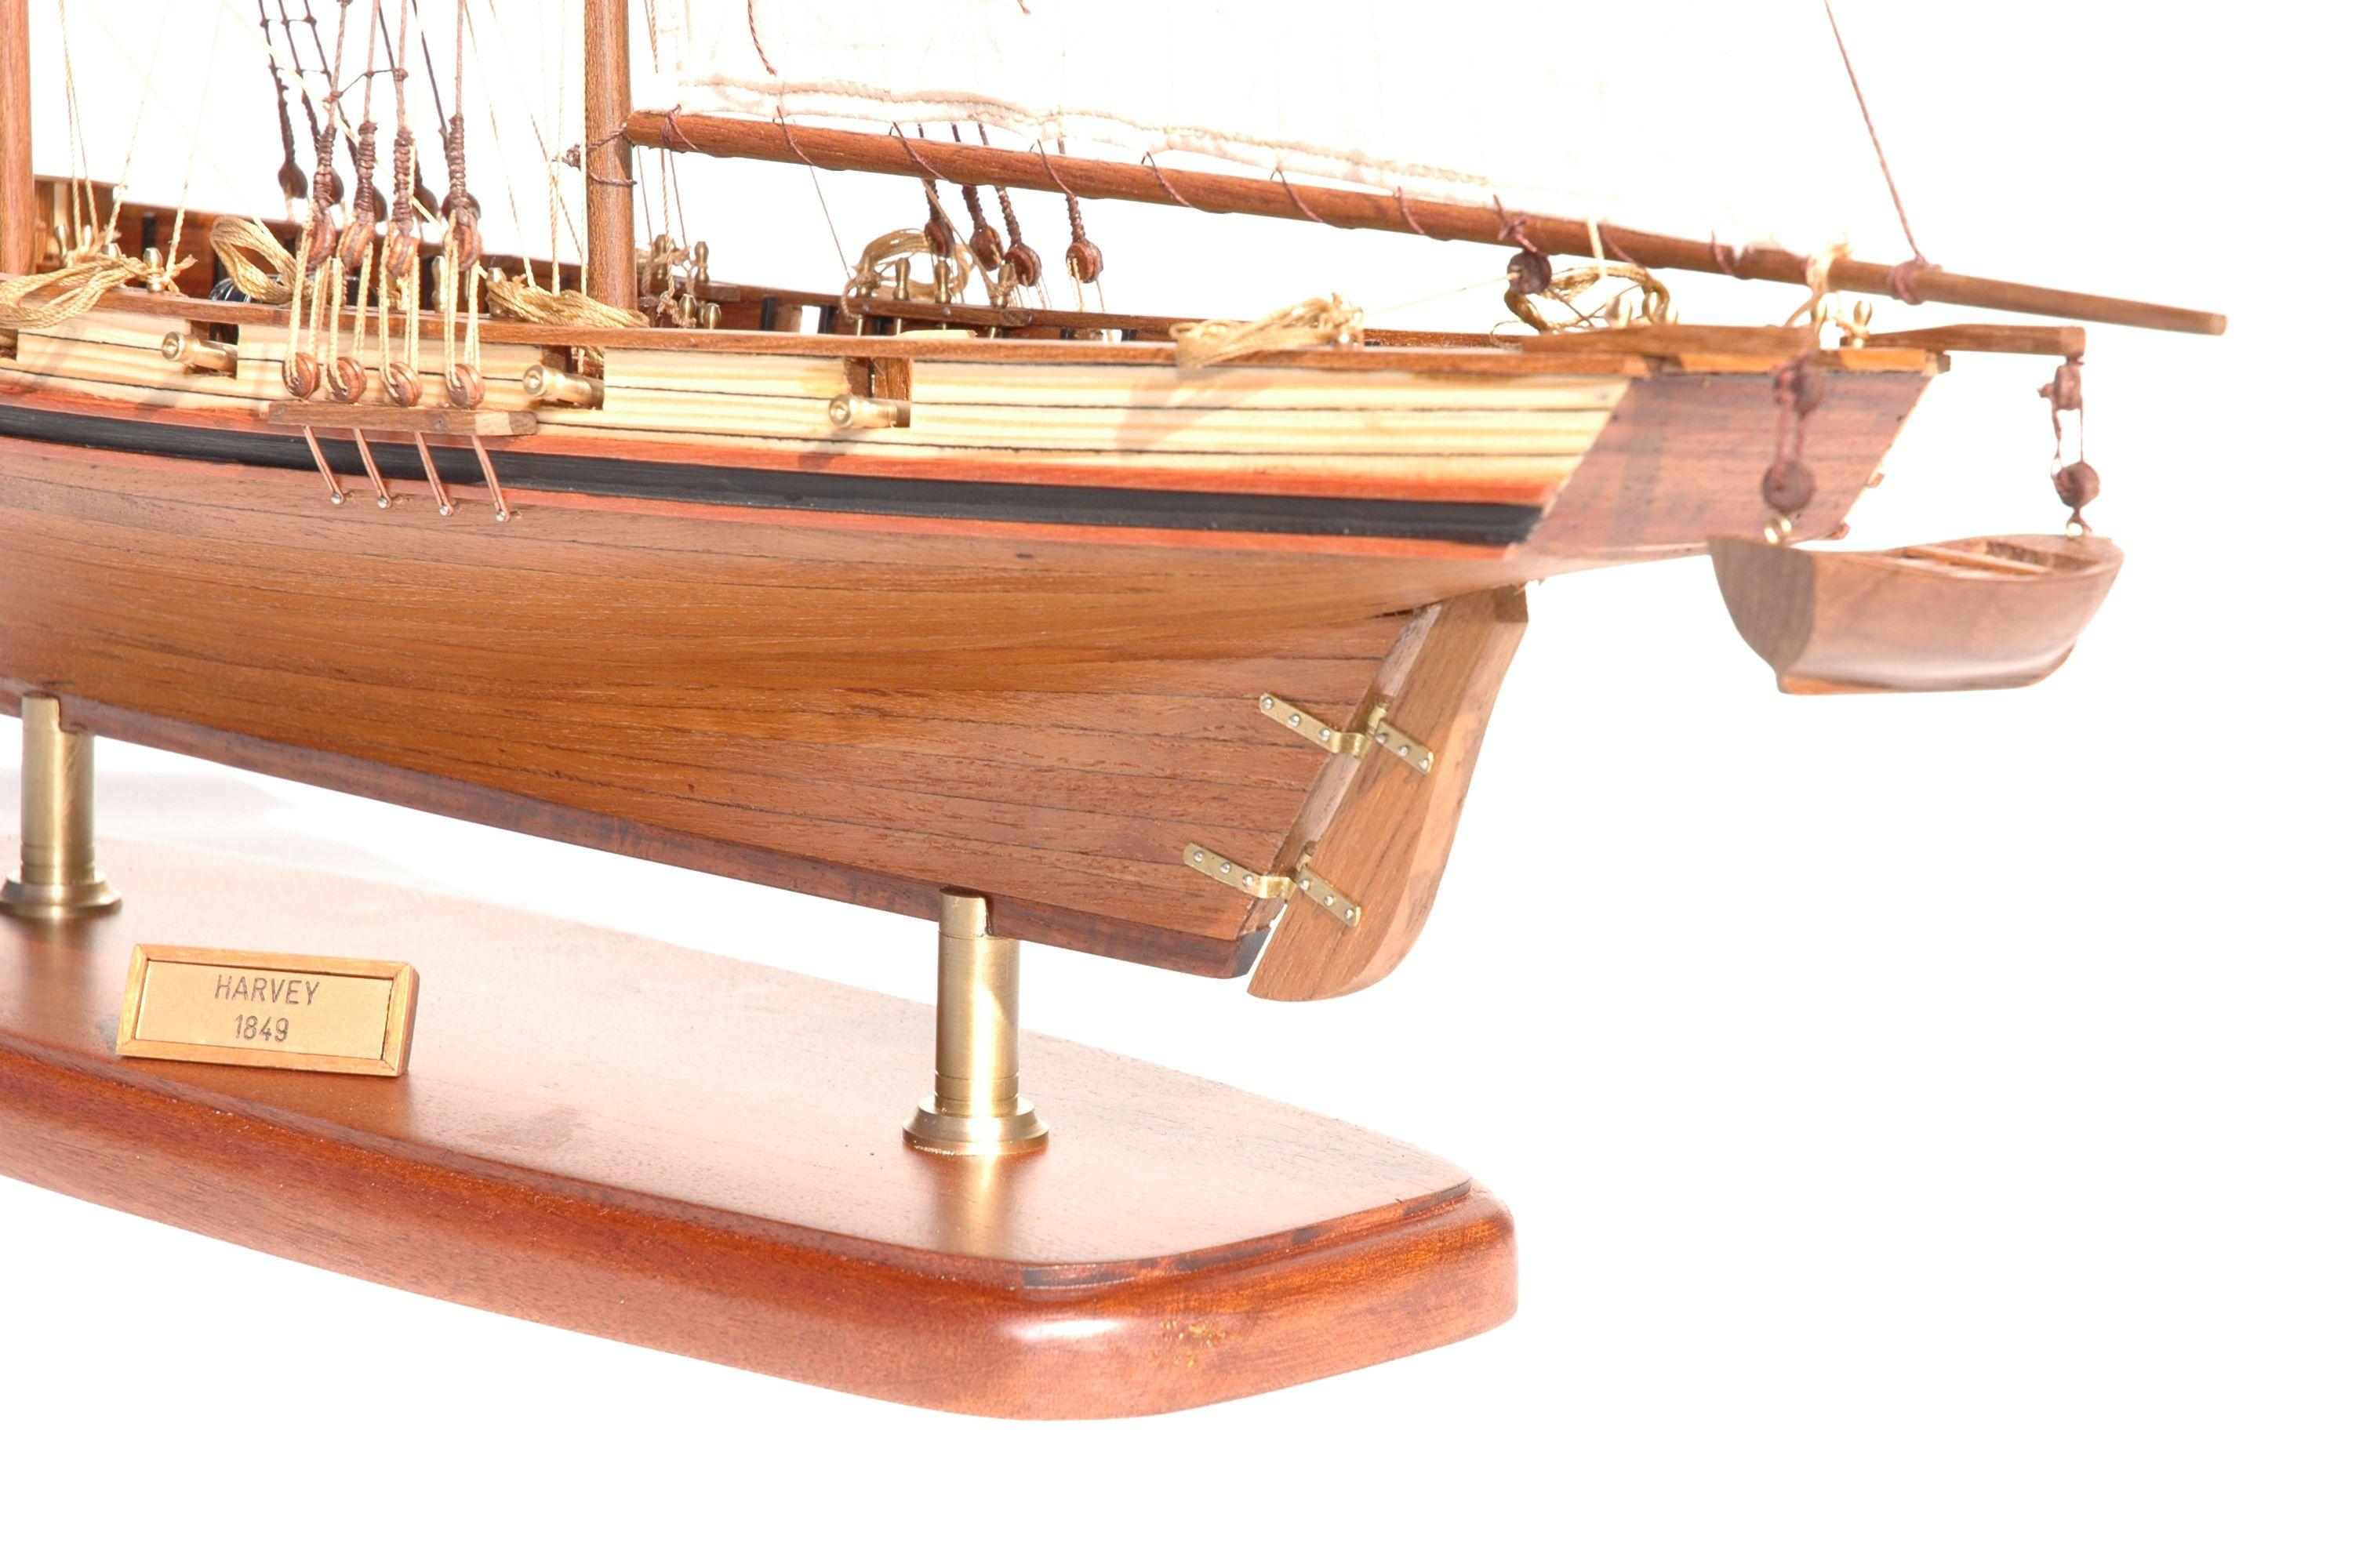 514-8308-Harvey-Model-Boat-Superior-Range